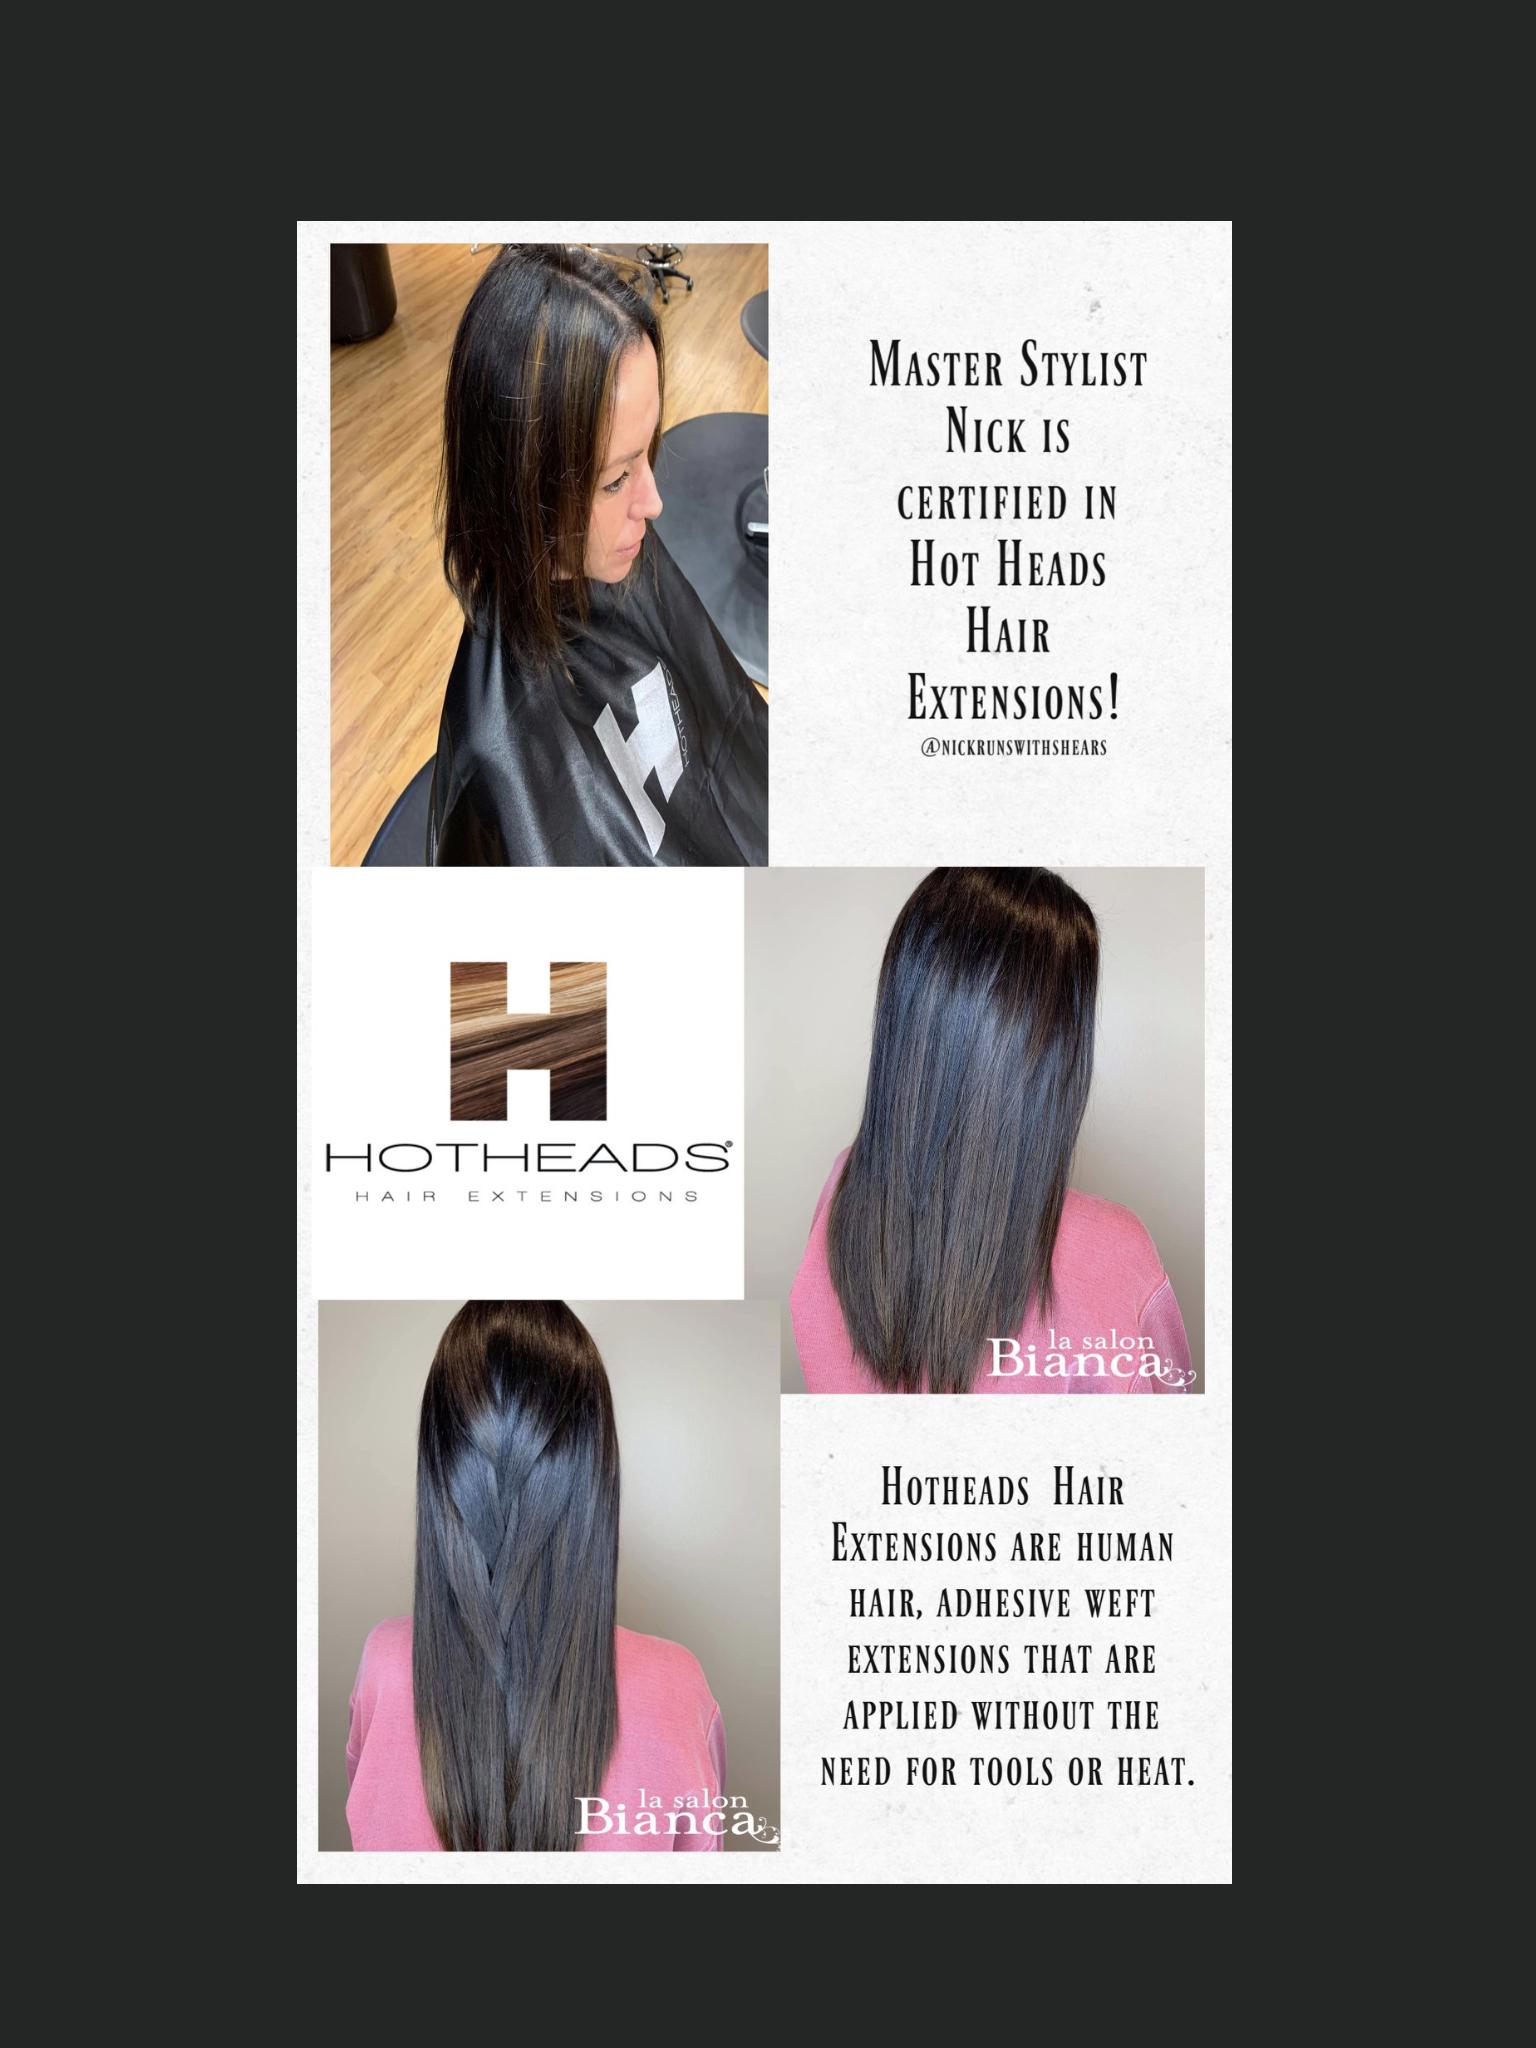 Hot Heads Extensions In 2020 Hot Heads Hair Extensions Best Salon Hair Salon